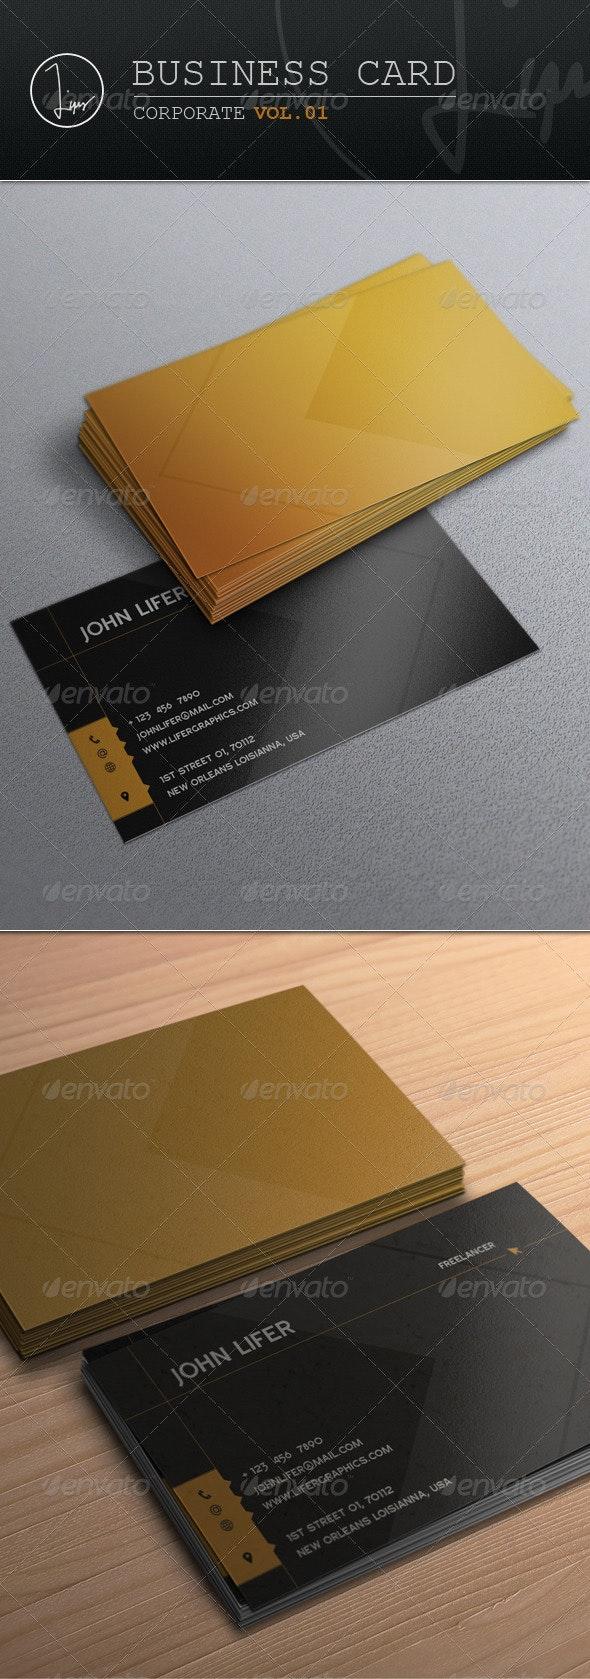 Business Card / Corporate Vol.01 - Corporate Business Cards